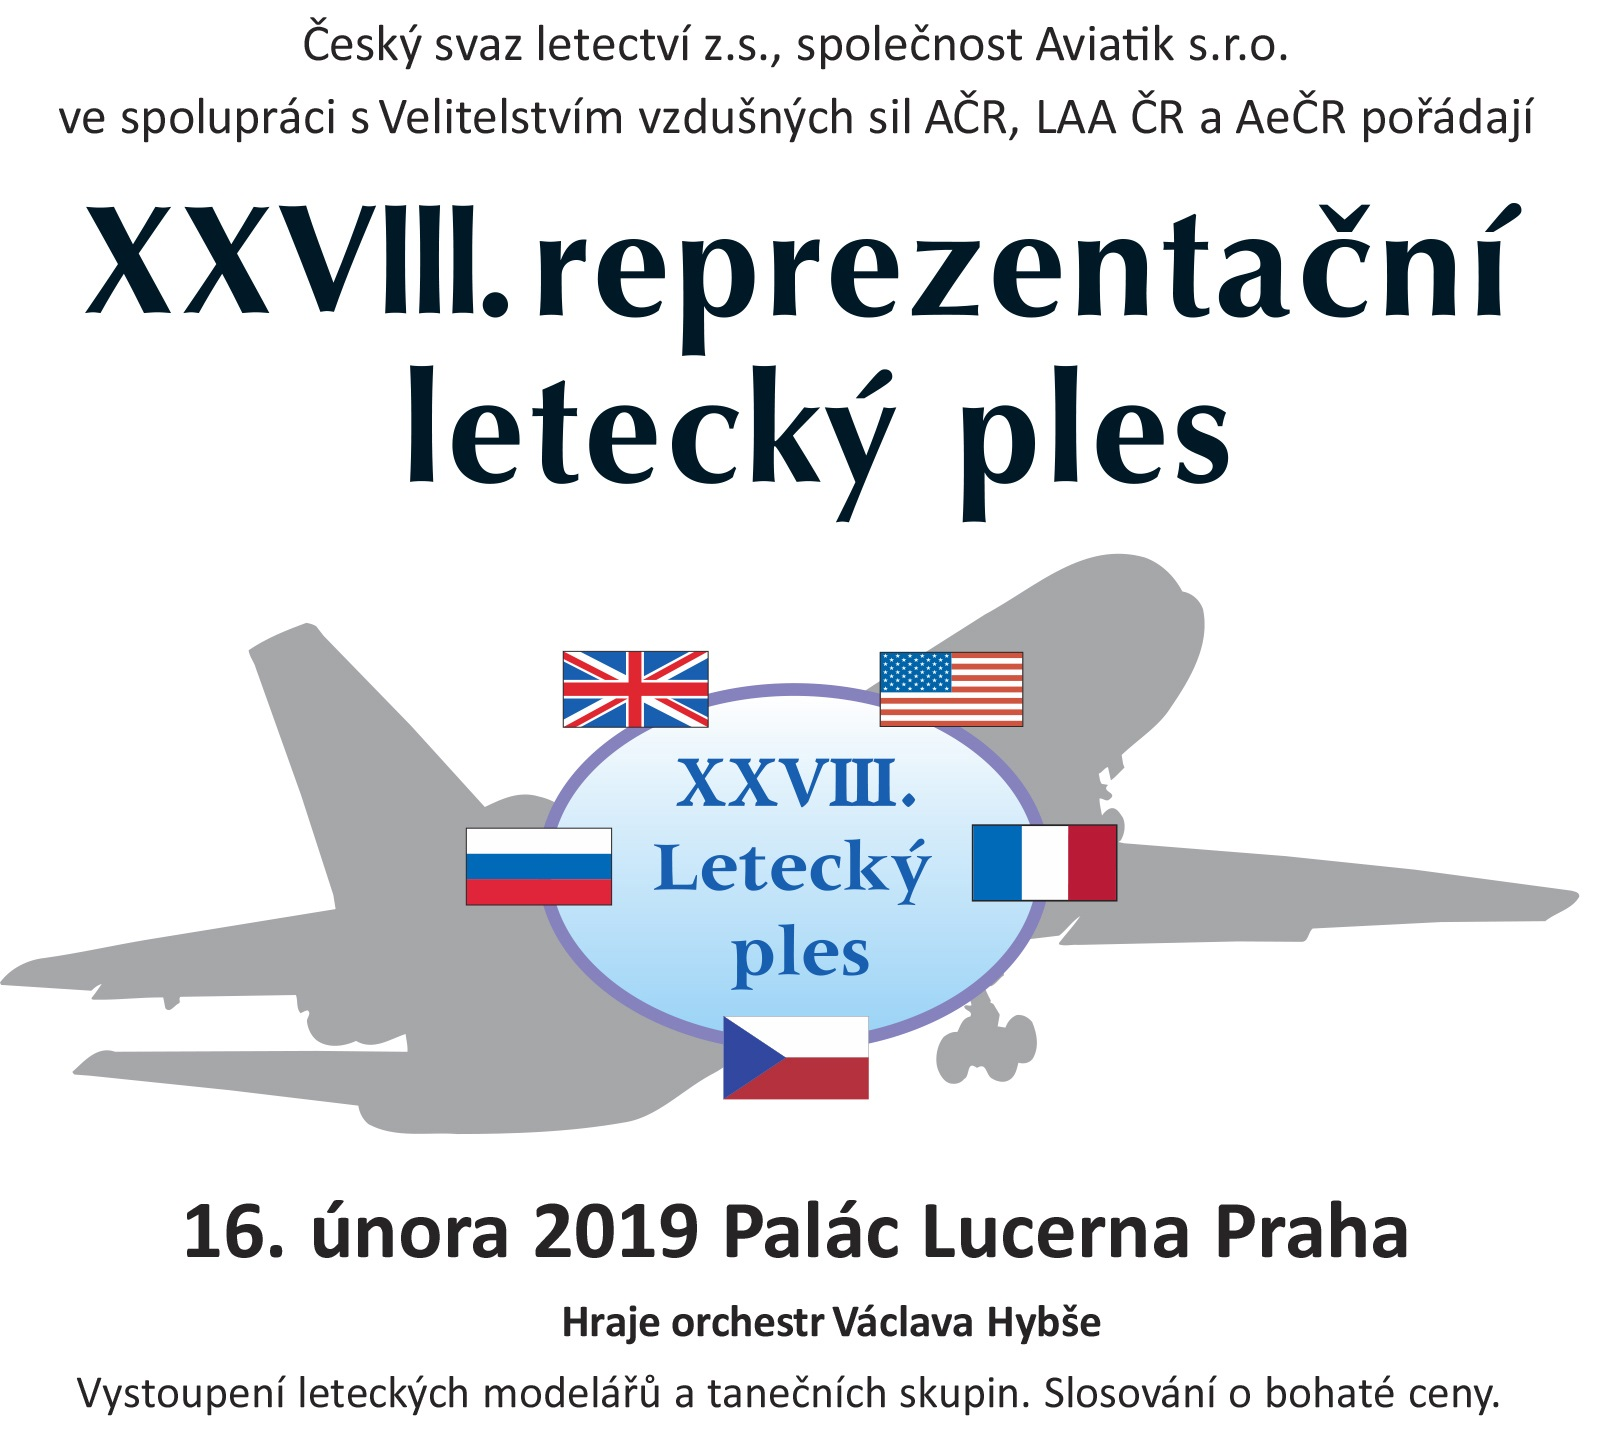 XXVIII. Reprezentační letecký ples